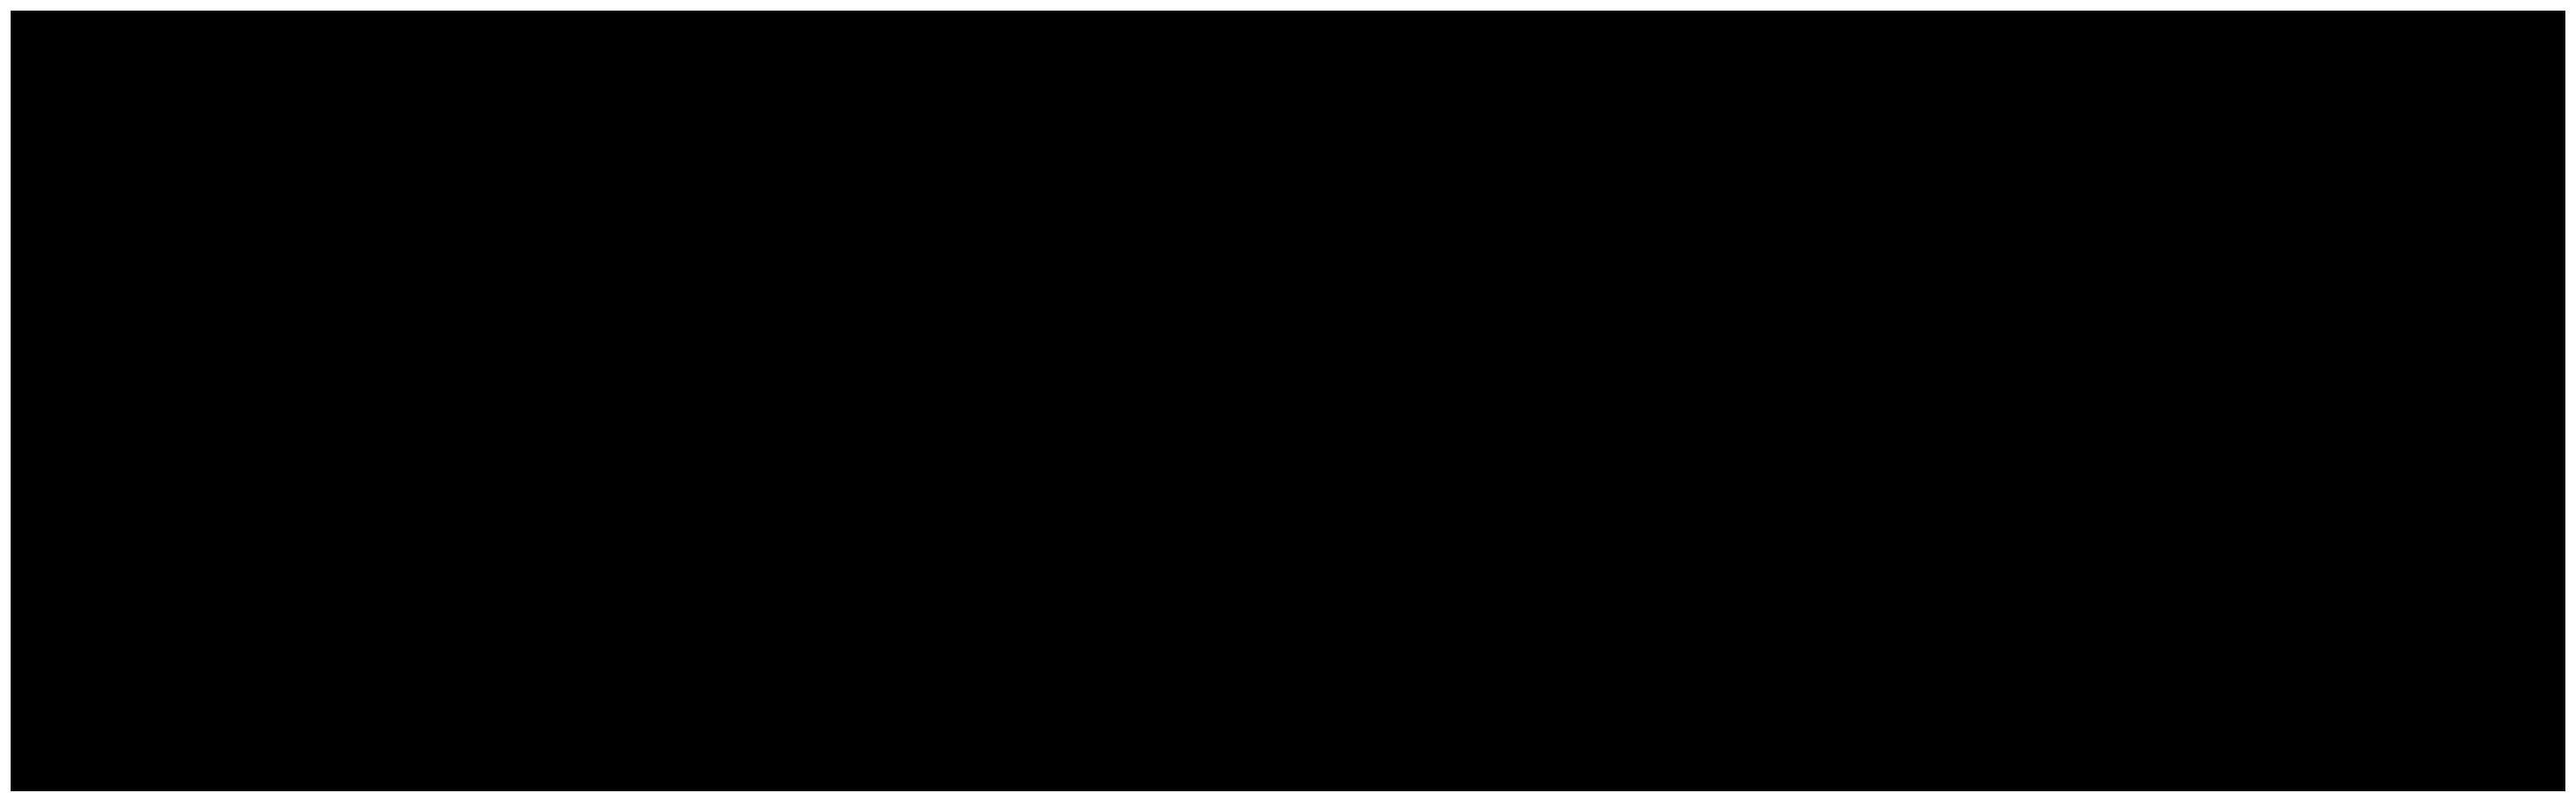 Hiraeth logo